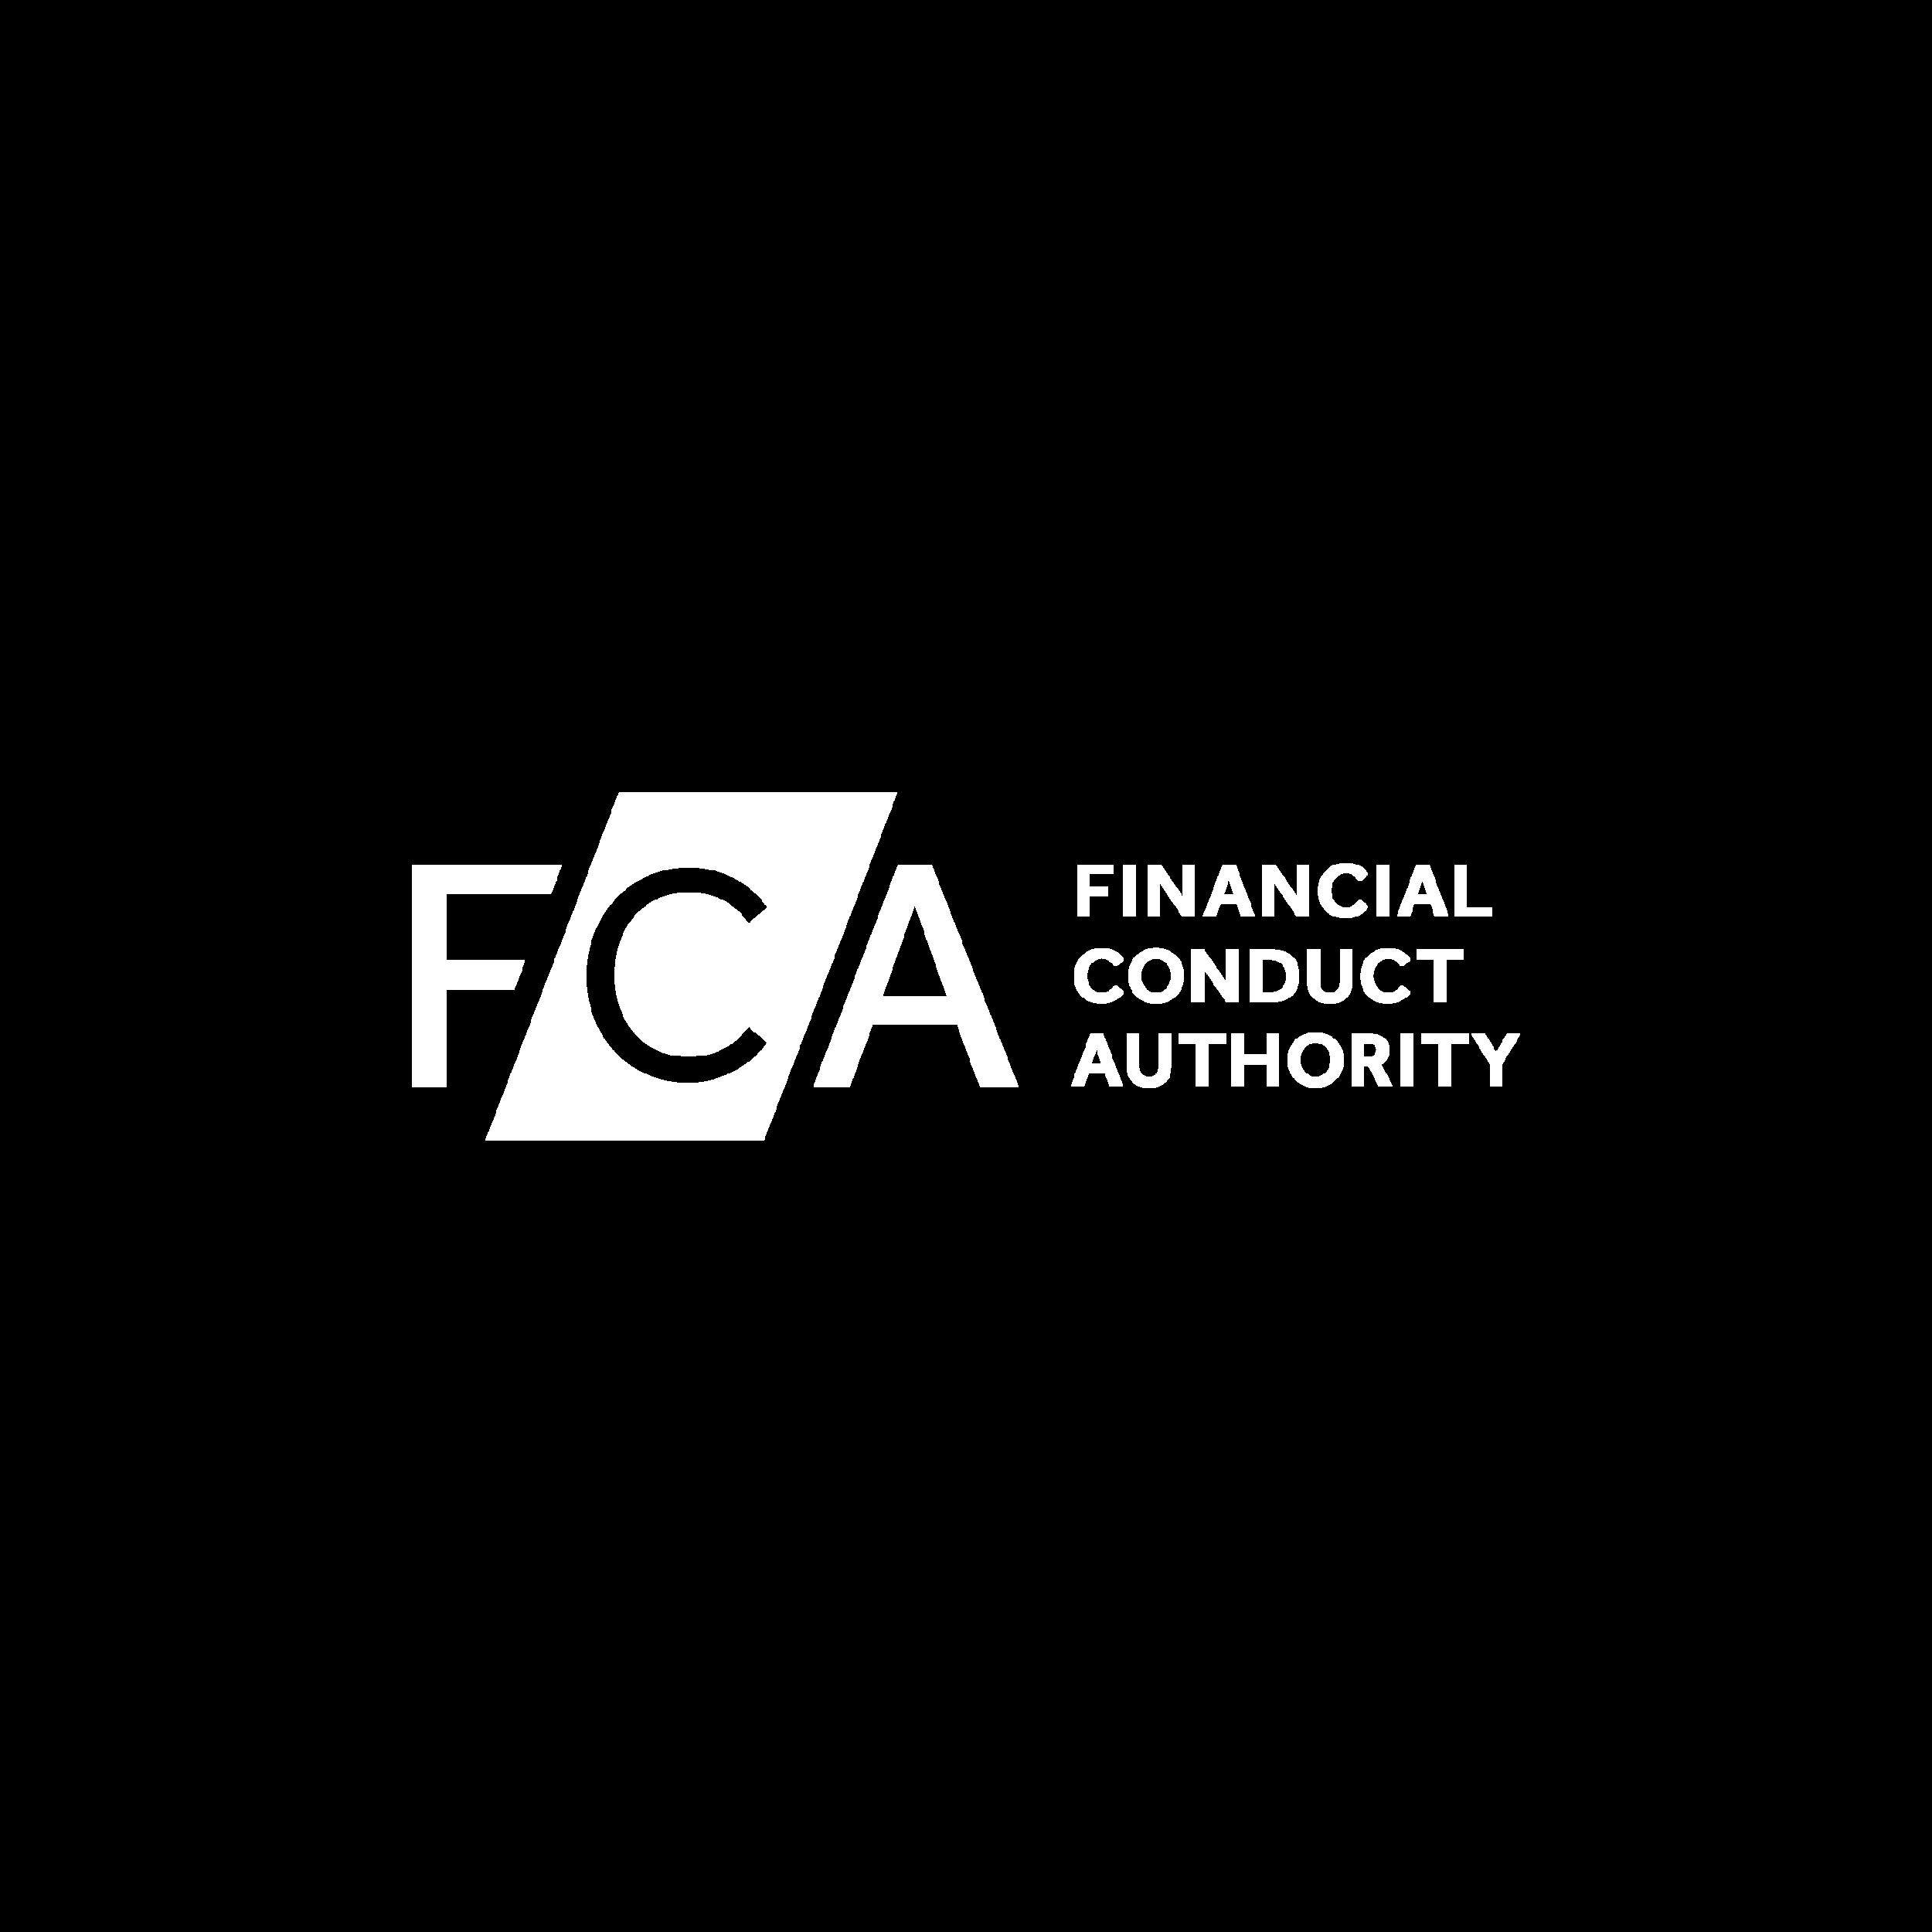 logo-white-fca.png